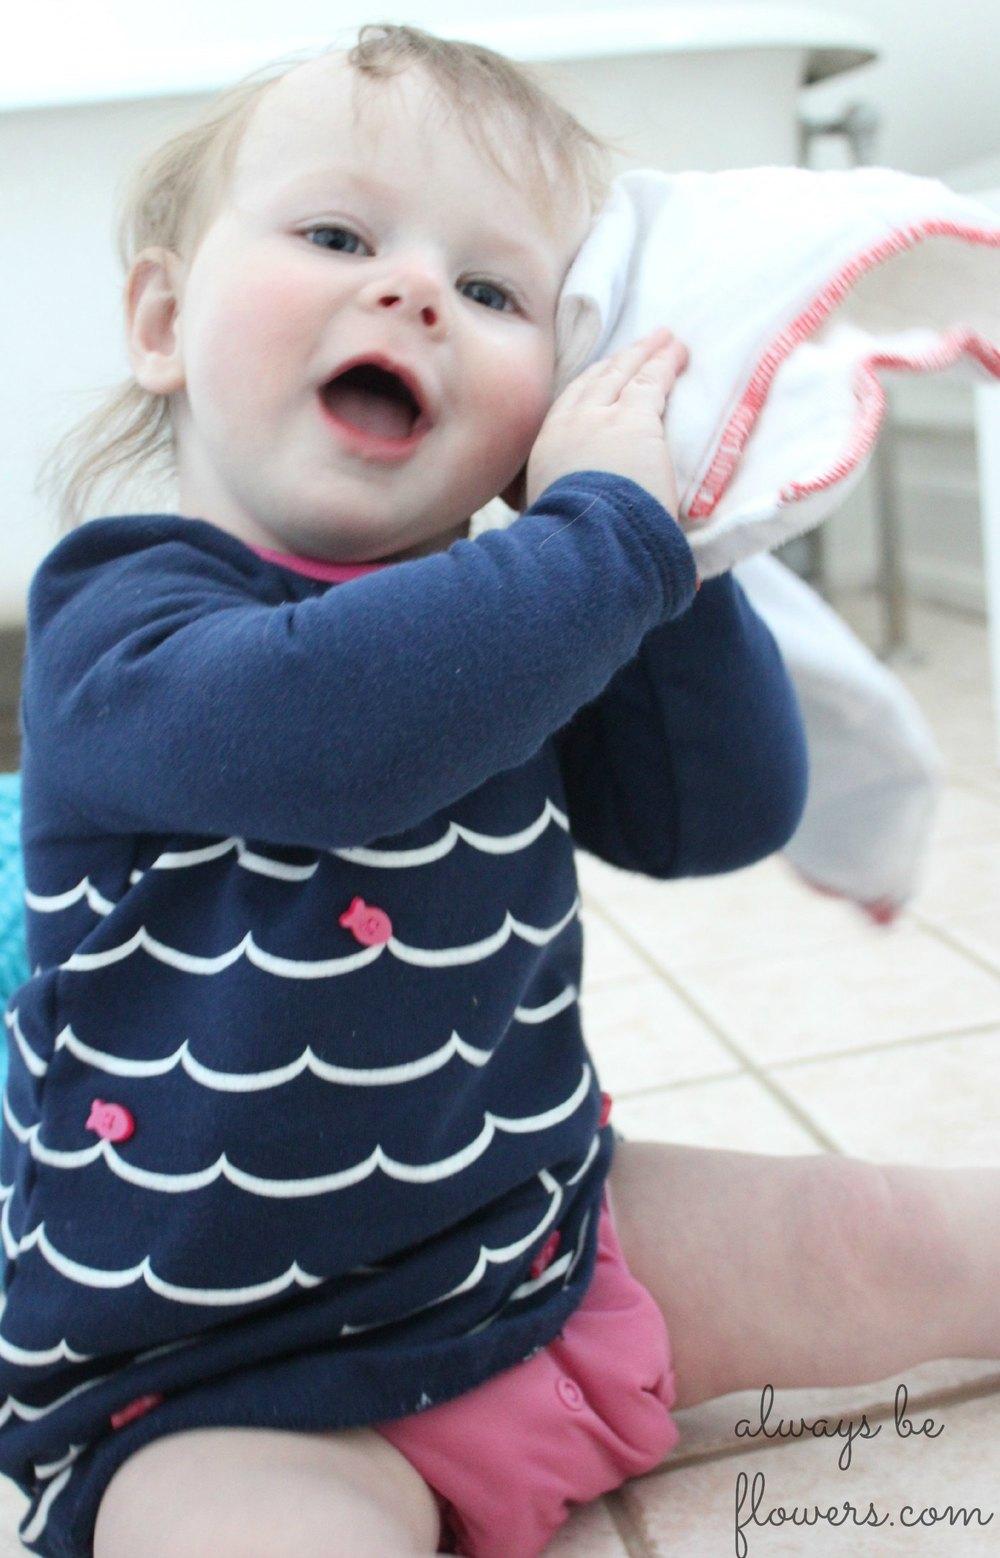 cloth-diapers-prefold-pink.jpg